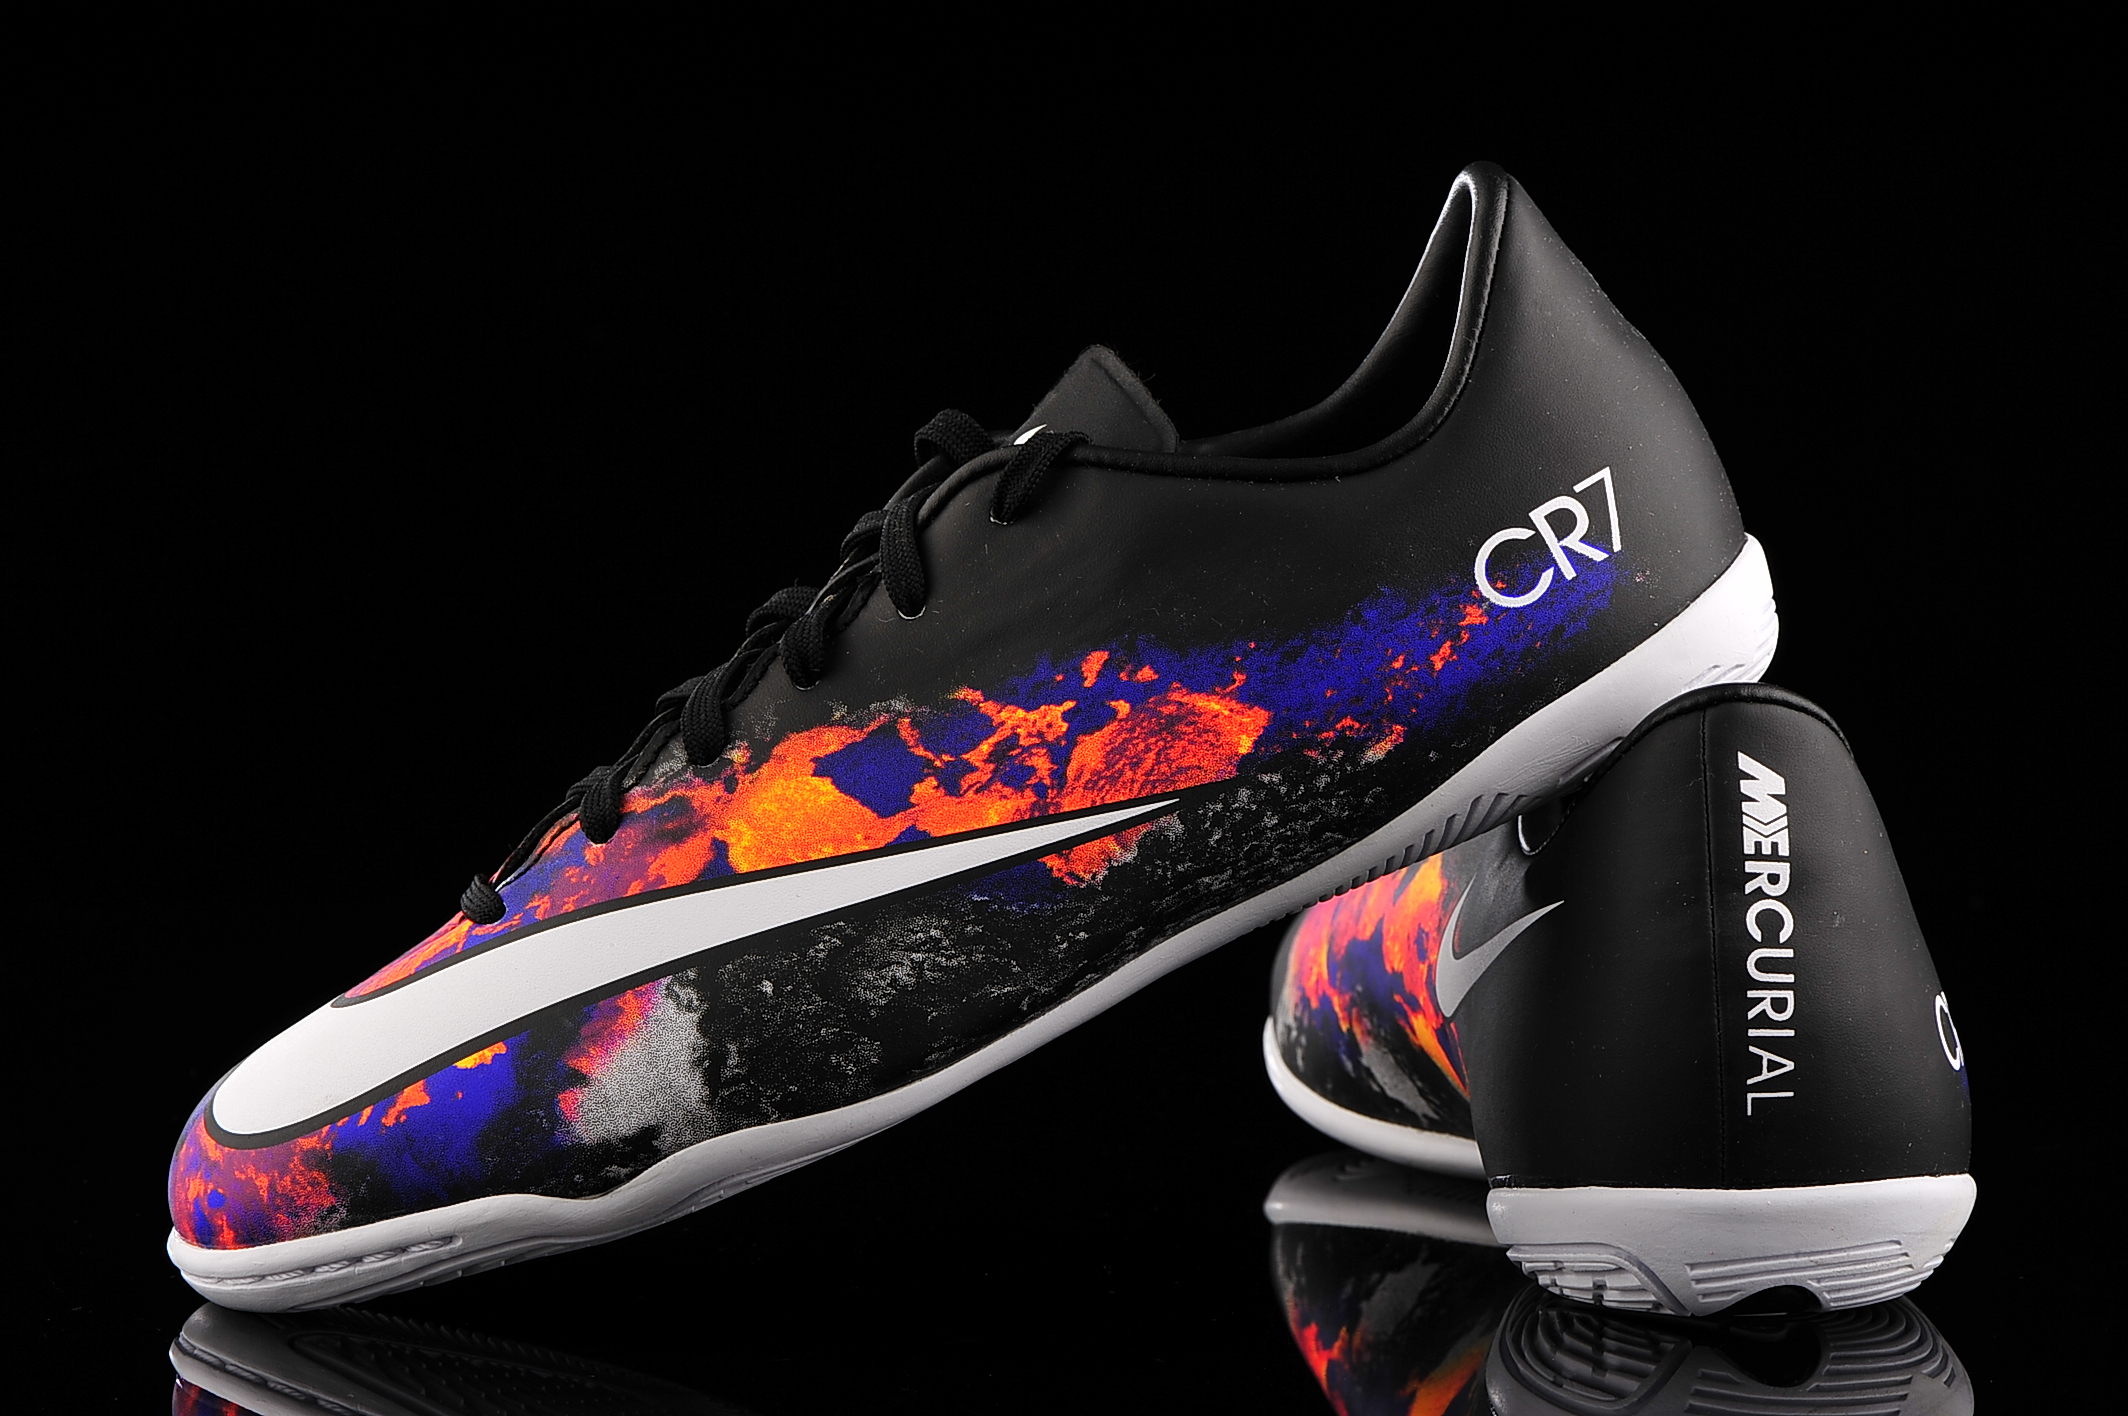 Y equipo Destino Categoría  Nike Mercurial Victory V IC CR7 Junior 684851-018 | R-GOL.com - Football  boots & equipment